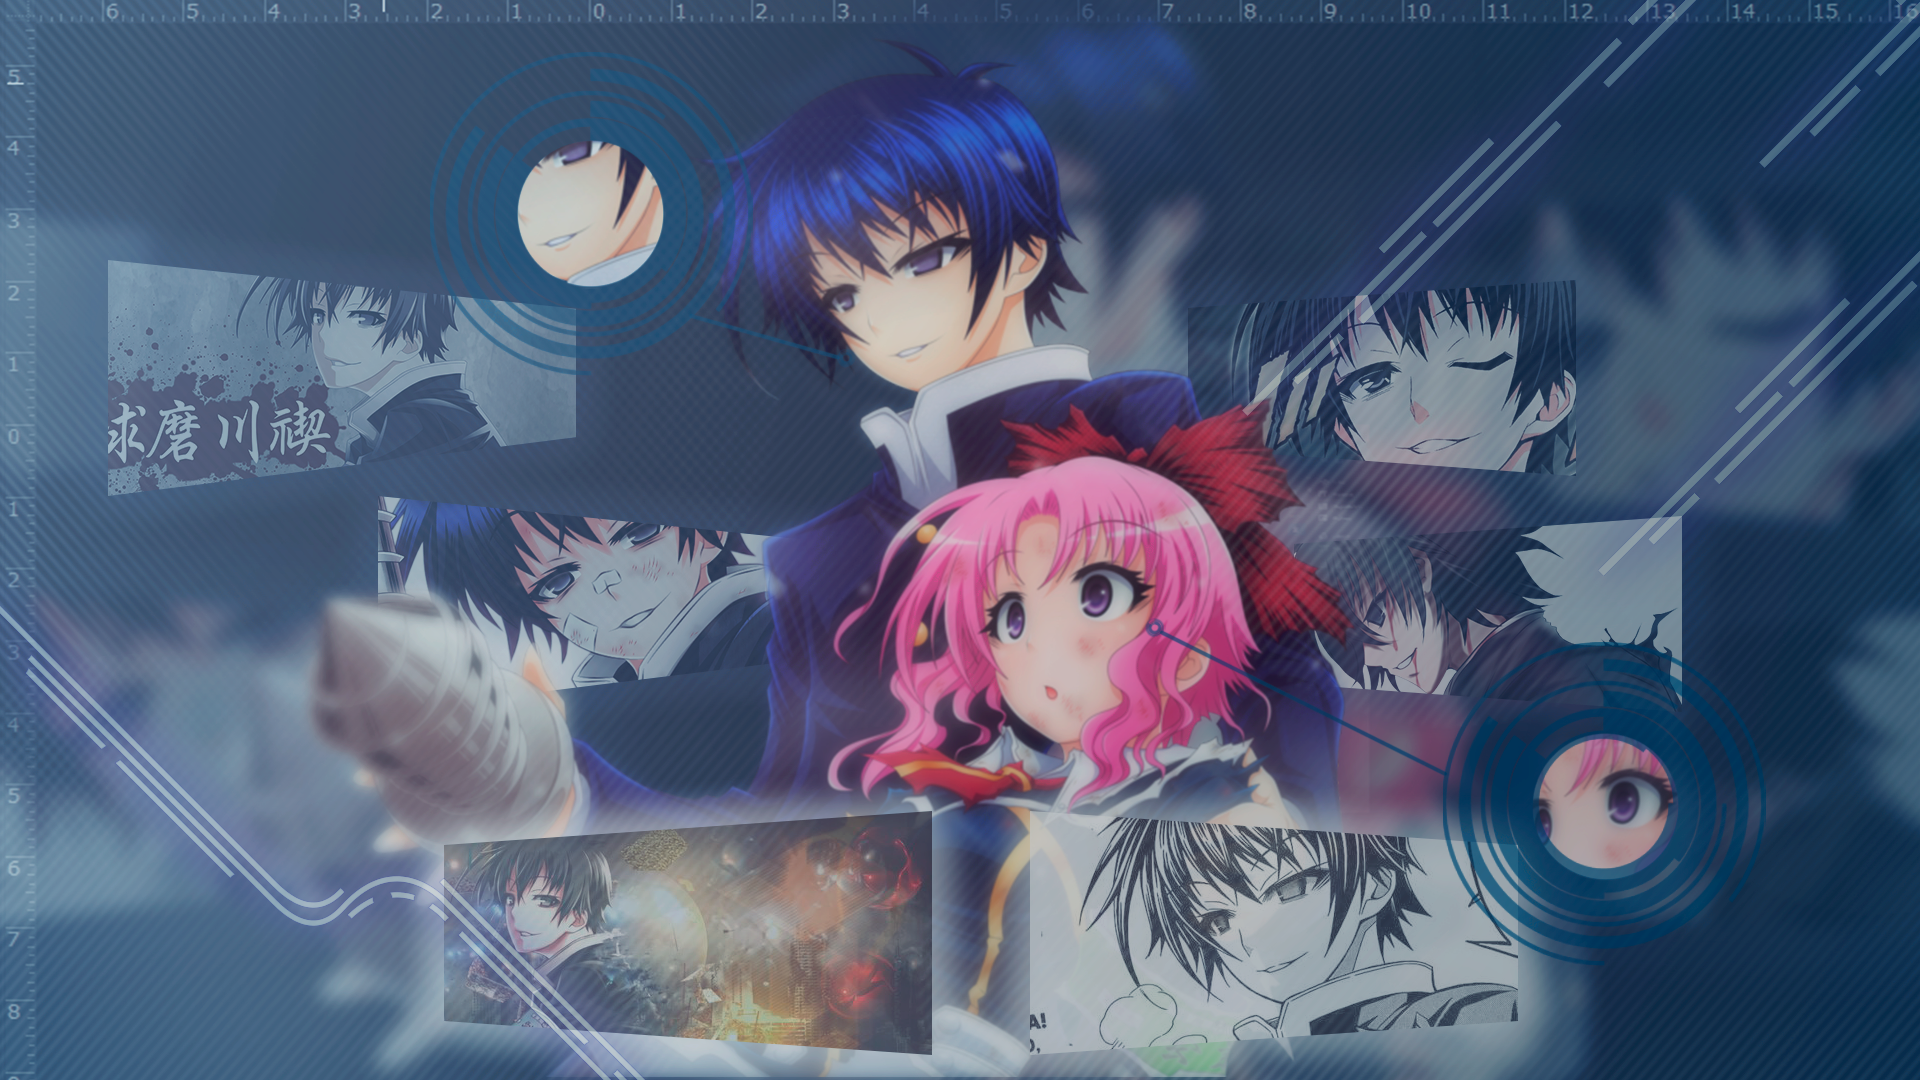 Medaka Box Anime Pink Hair Blue Hair Anime Girls Anime Boys Wallpaper Resolution 1920x1080 Id 699123 Wallha Com